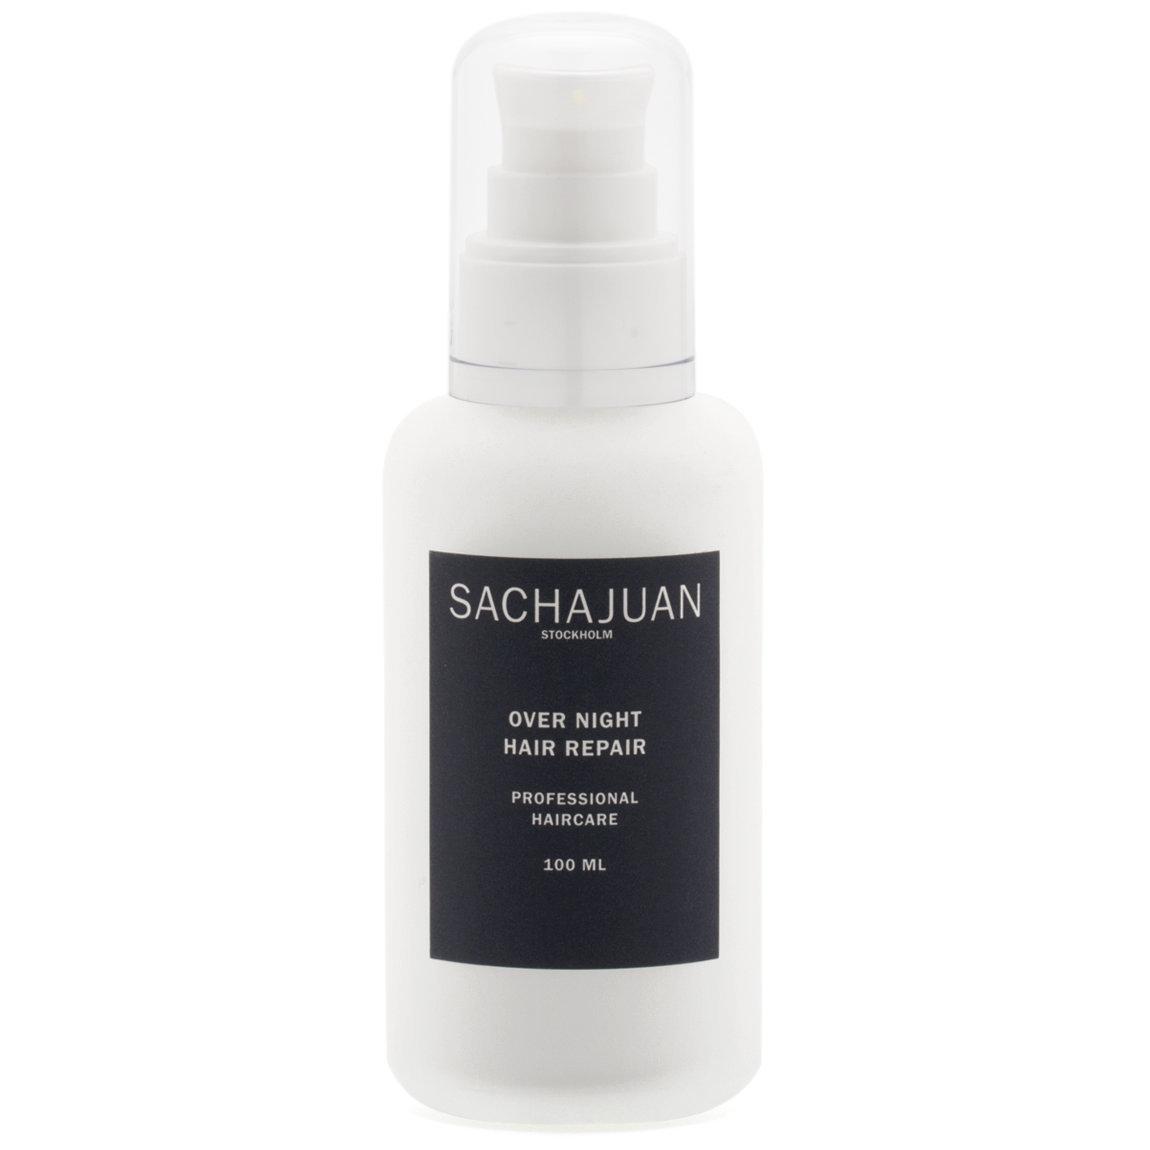 SACHAJUAN Overnight Hair Repair alternative view 1 - product swatch.